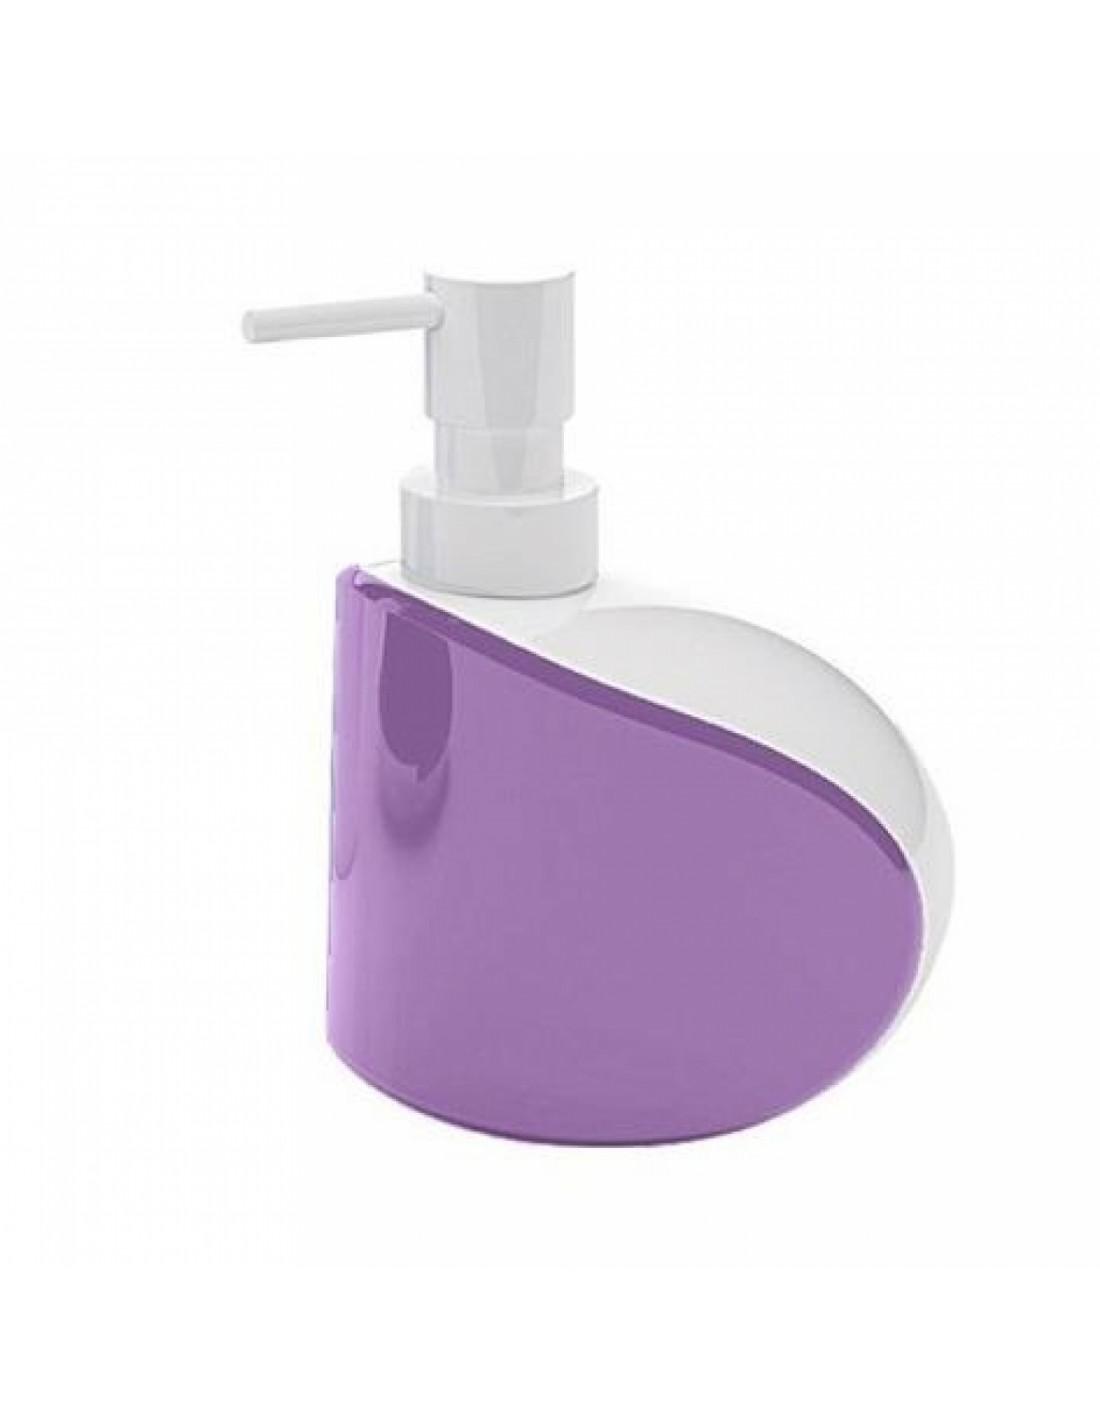 distributeur de savon liquide moby blanc lilas de la marque gedy. Black Bedroom Furniture Sets. Home Design Ideas